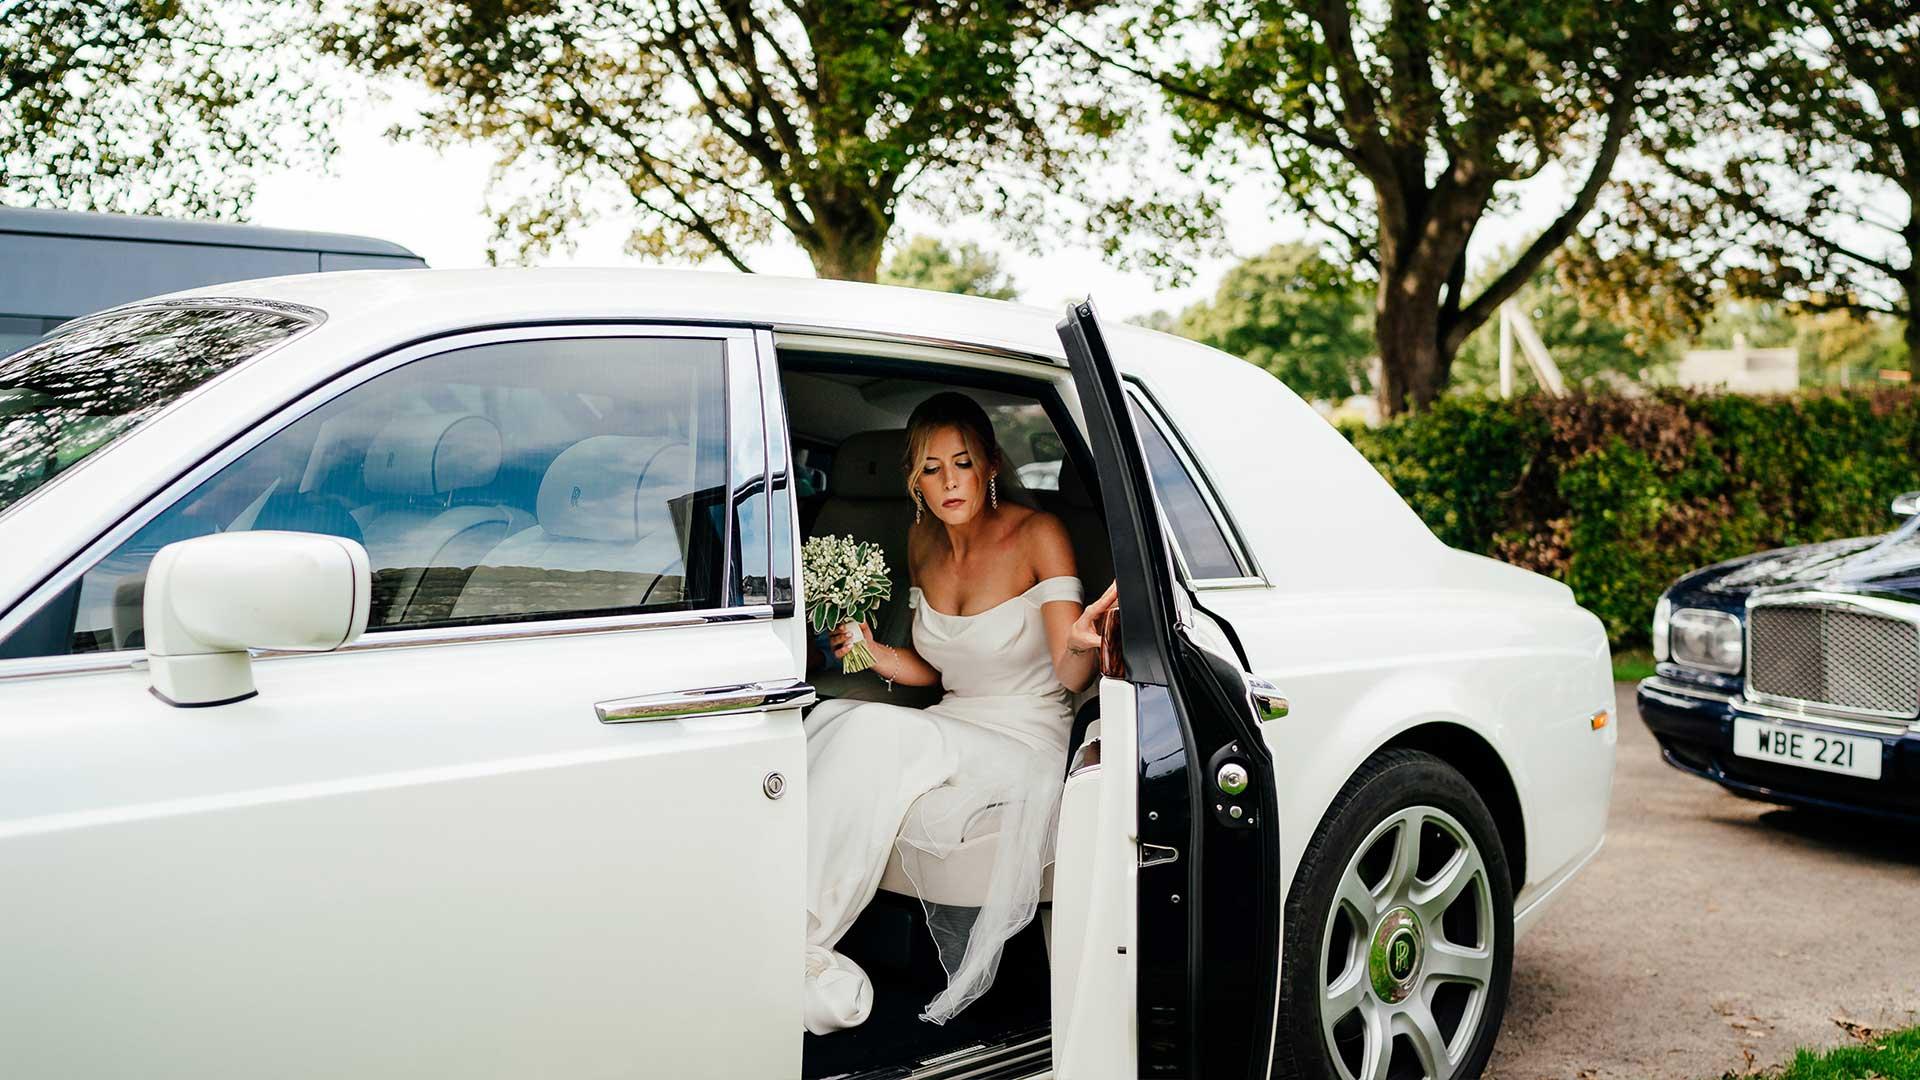 Katie in the Rolls-Royce Phantom wedding car